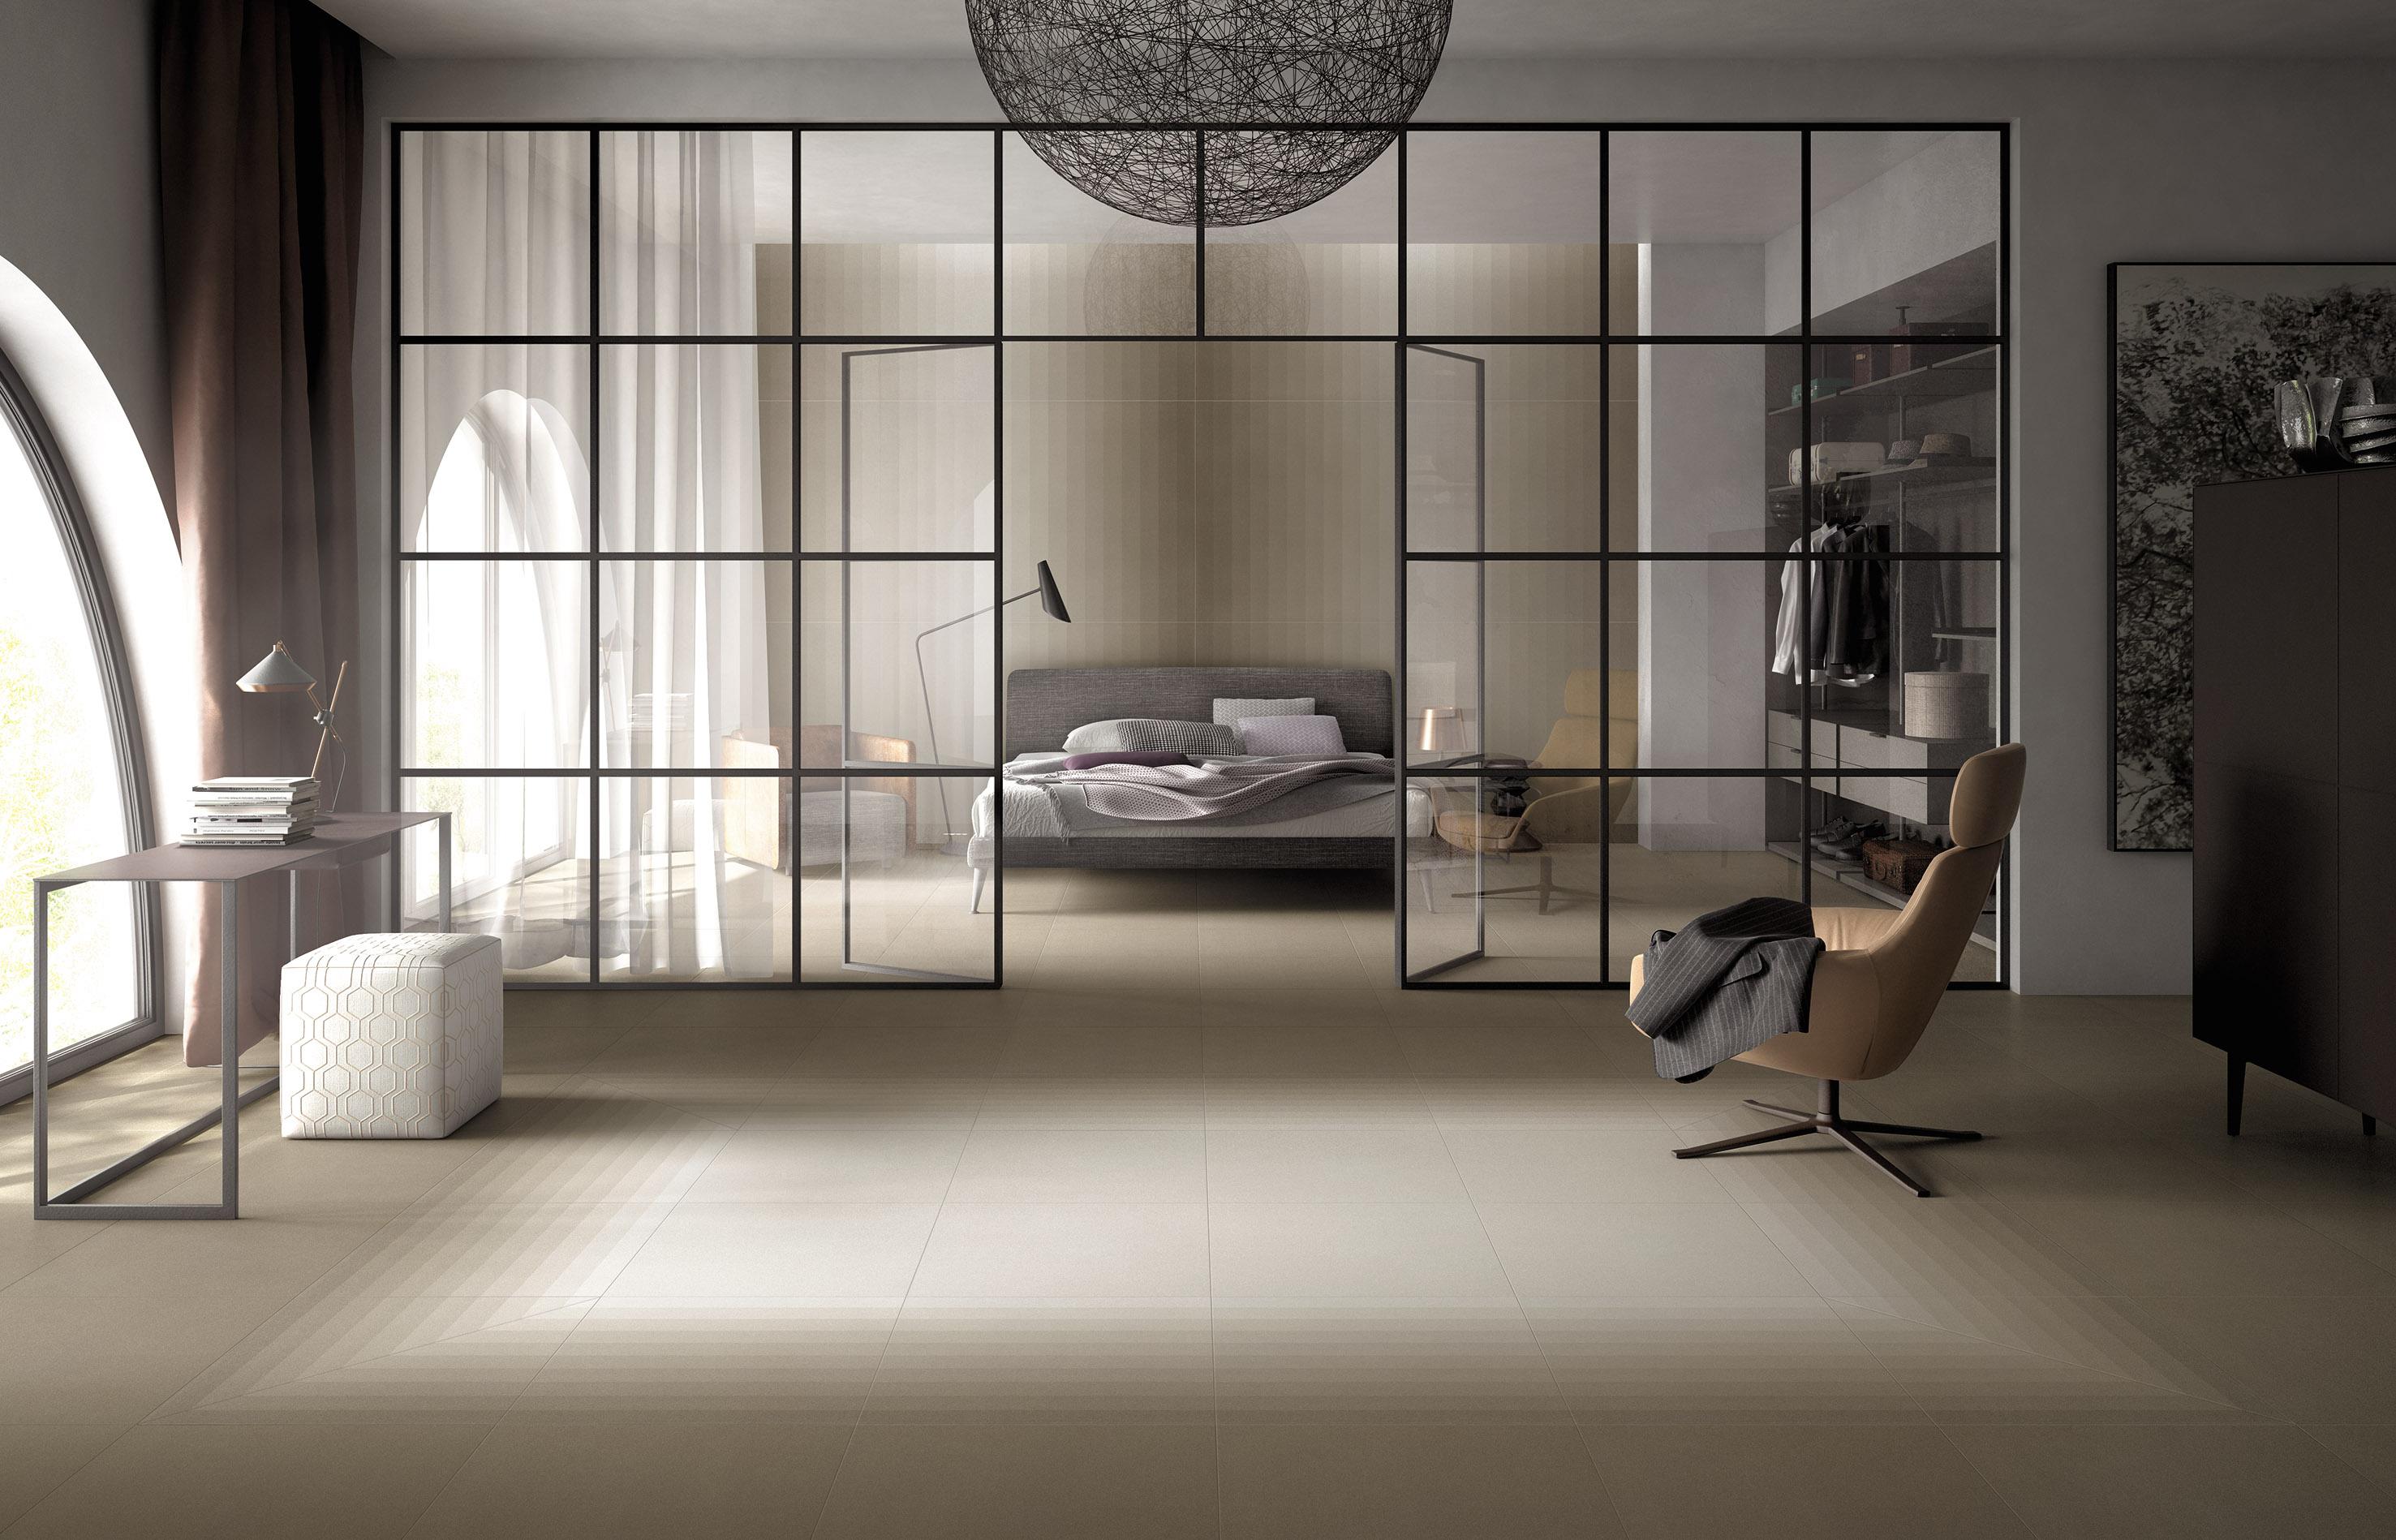 comptoir du carrelage accueil comptoir du carrelage ohnenheim. Black Bedroom Furniture Sets. Home Design Ideas